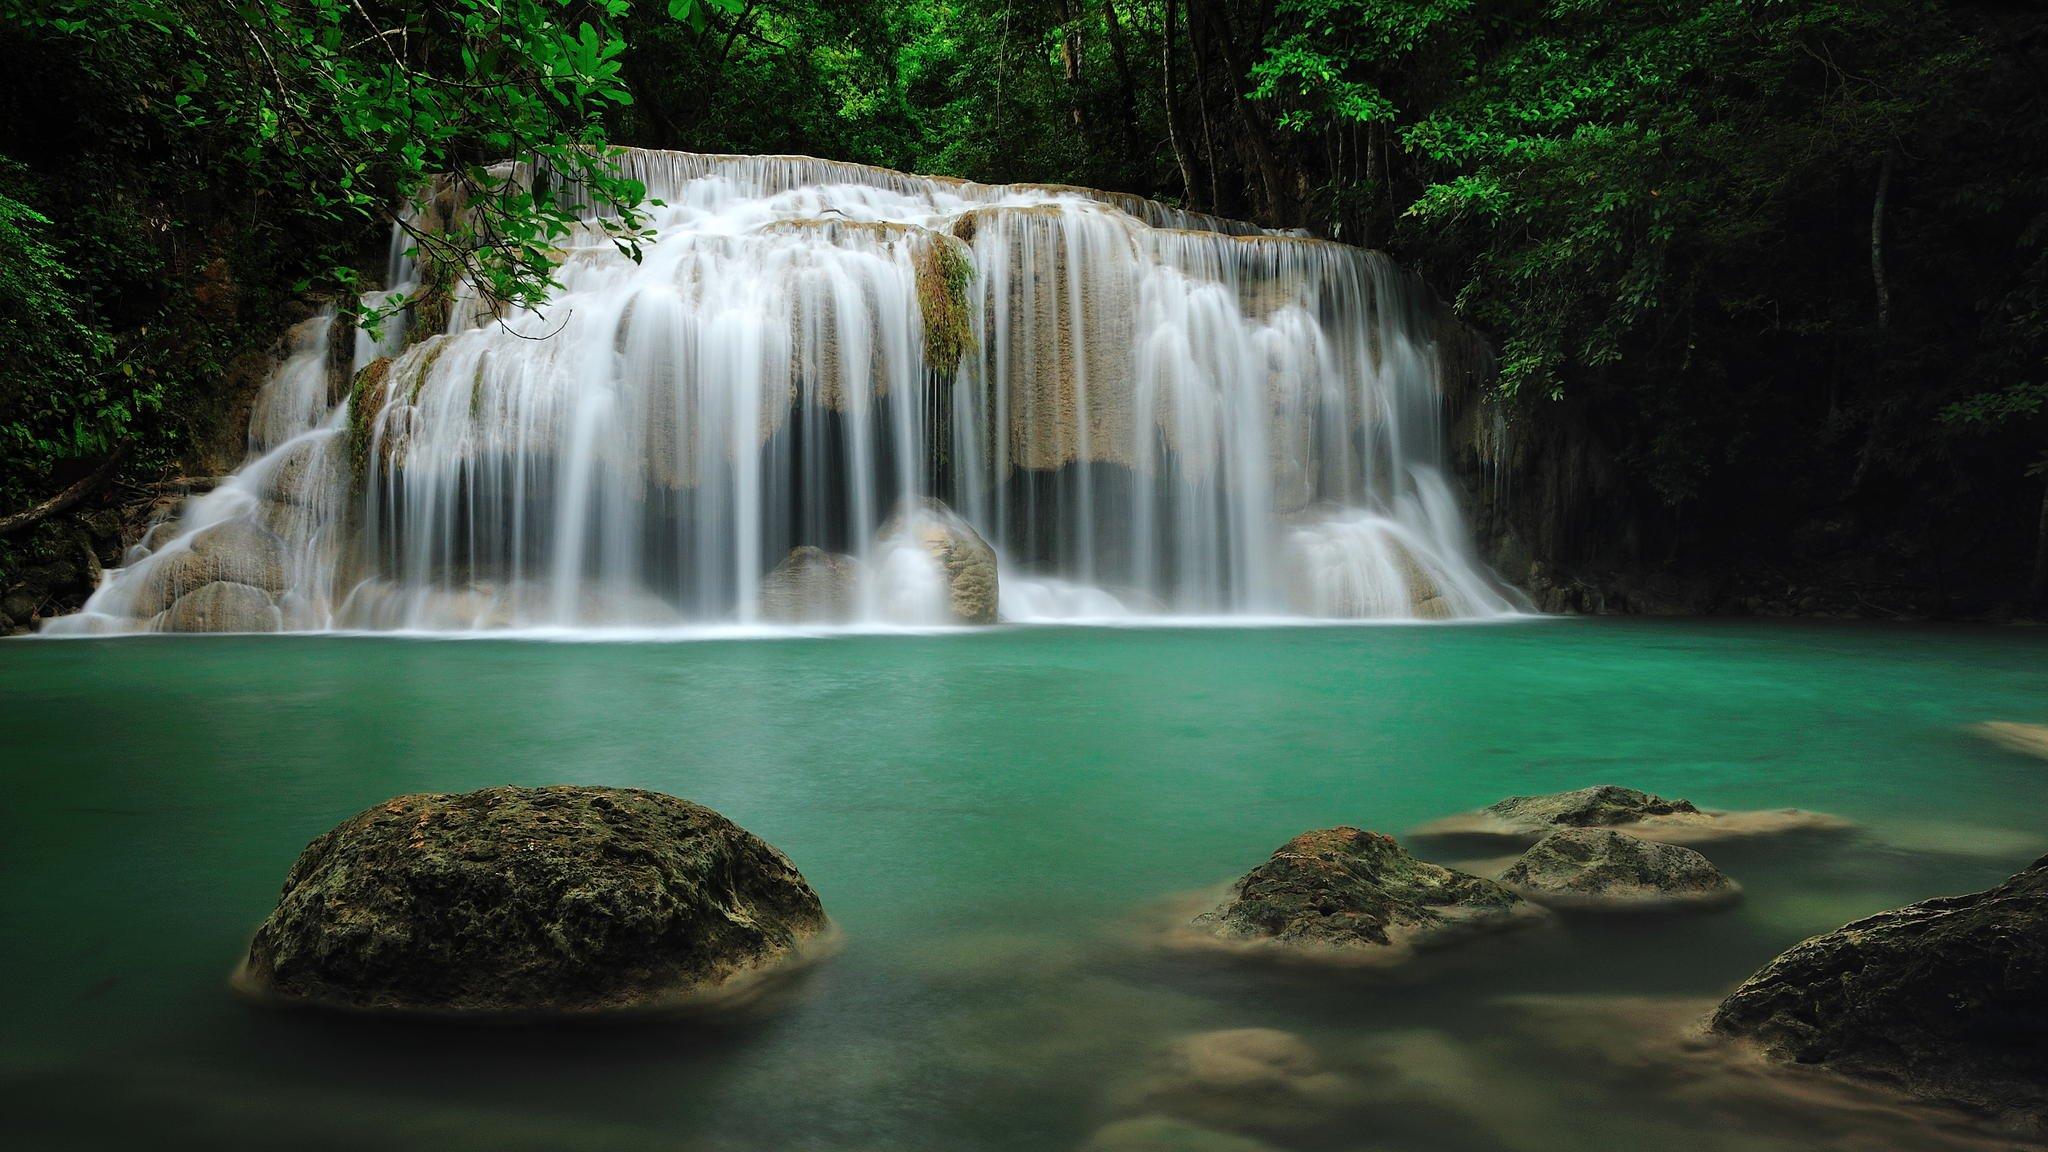 Falls Hd Wallpaper Free Download Erawan Falls Thailand Hd Wallpaper